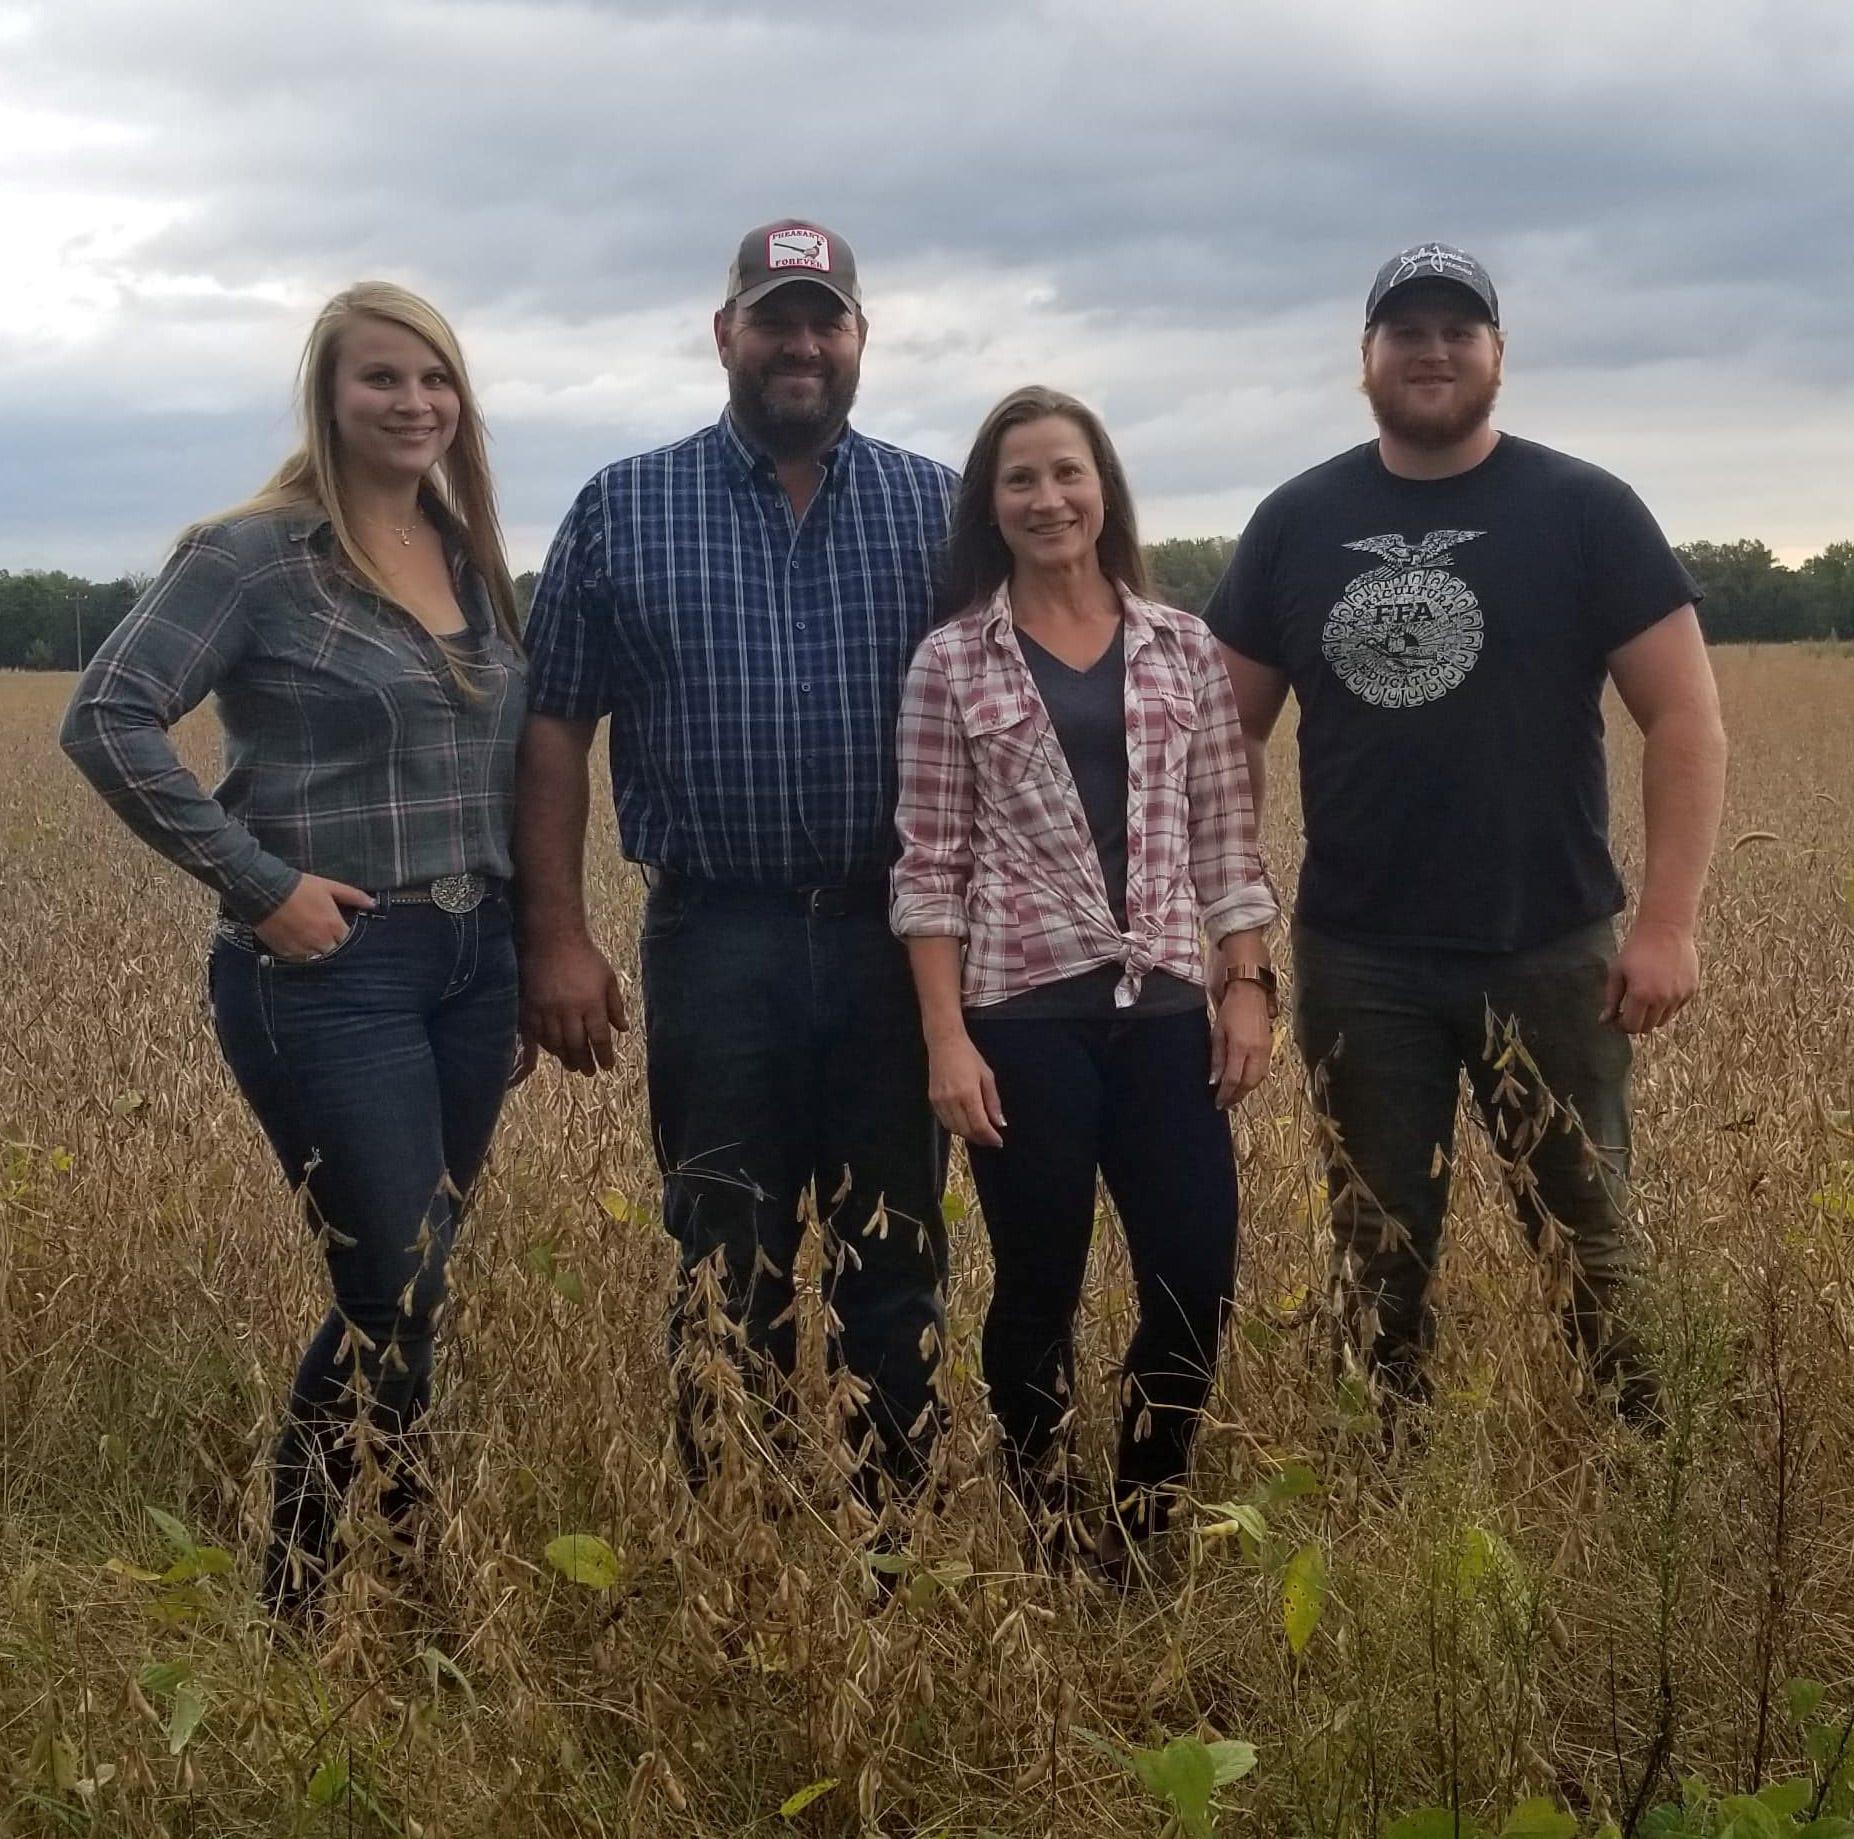 Precision ag technology improving bottom line and wildlife habitat on Lake Family Farm